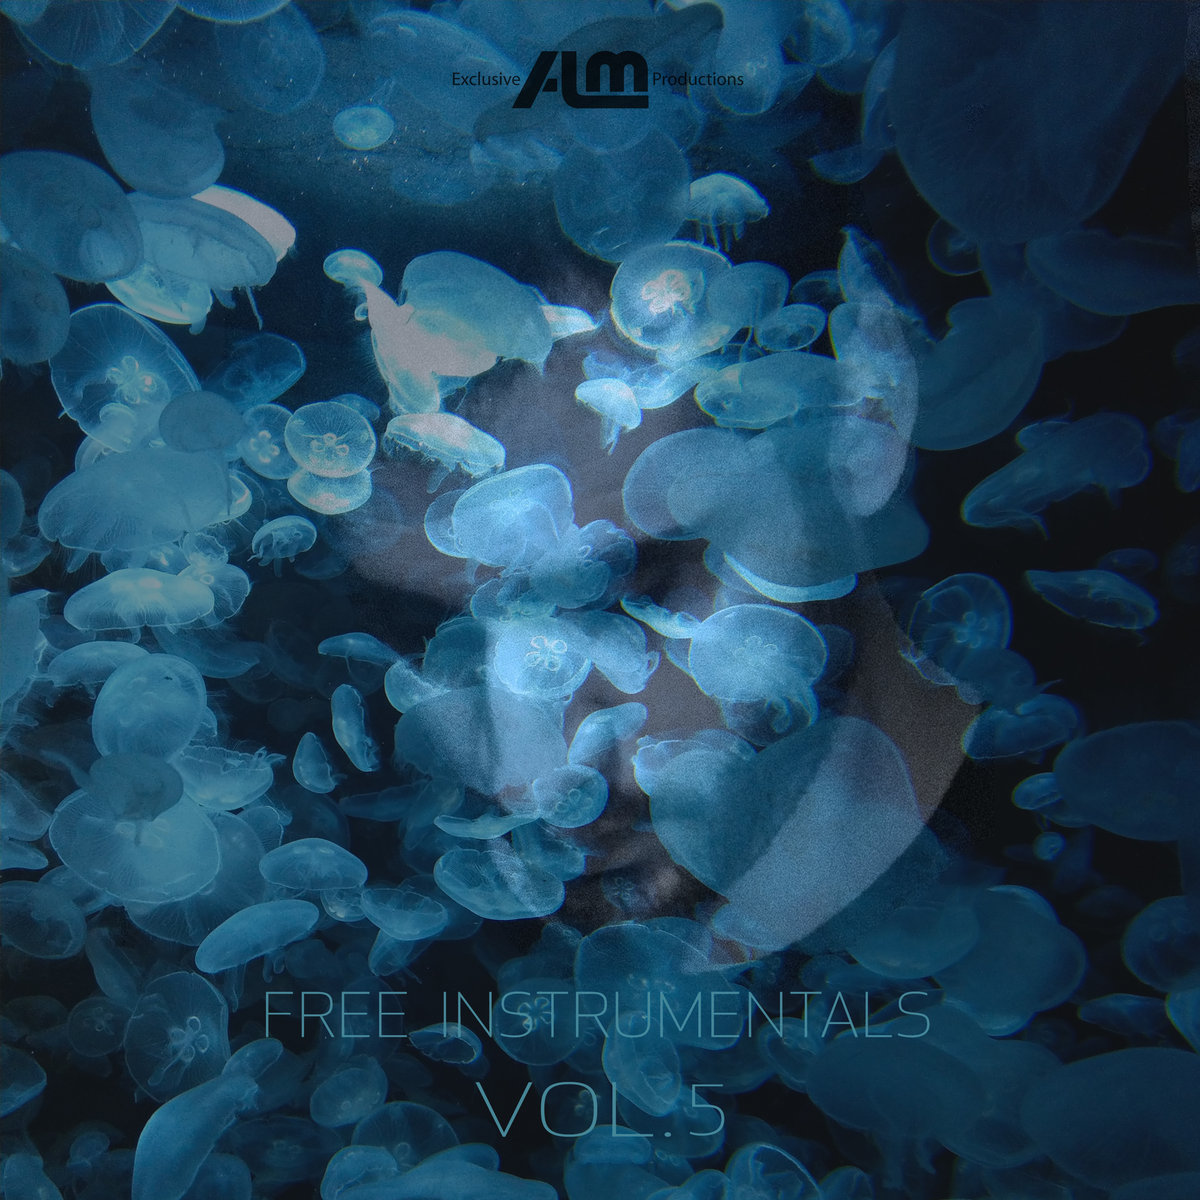 Free Instrumentals, Vol  5 | ALM Productions